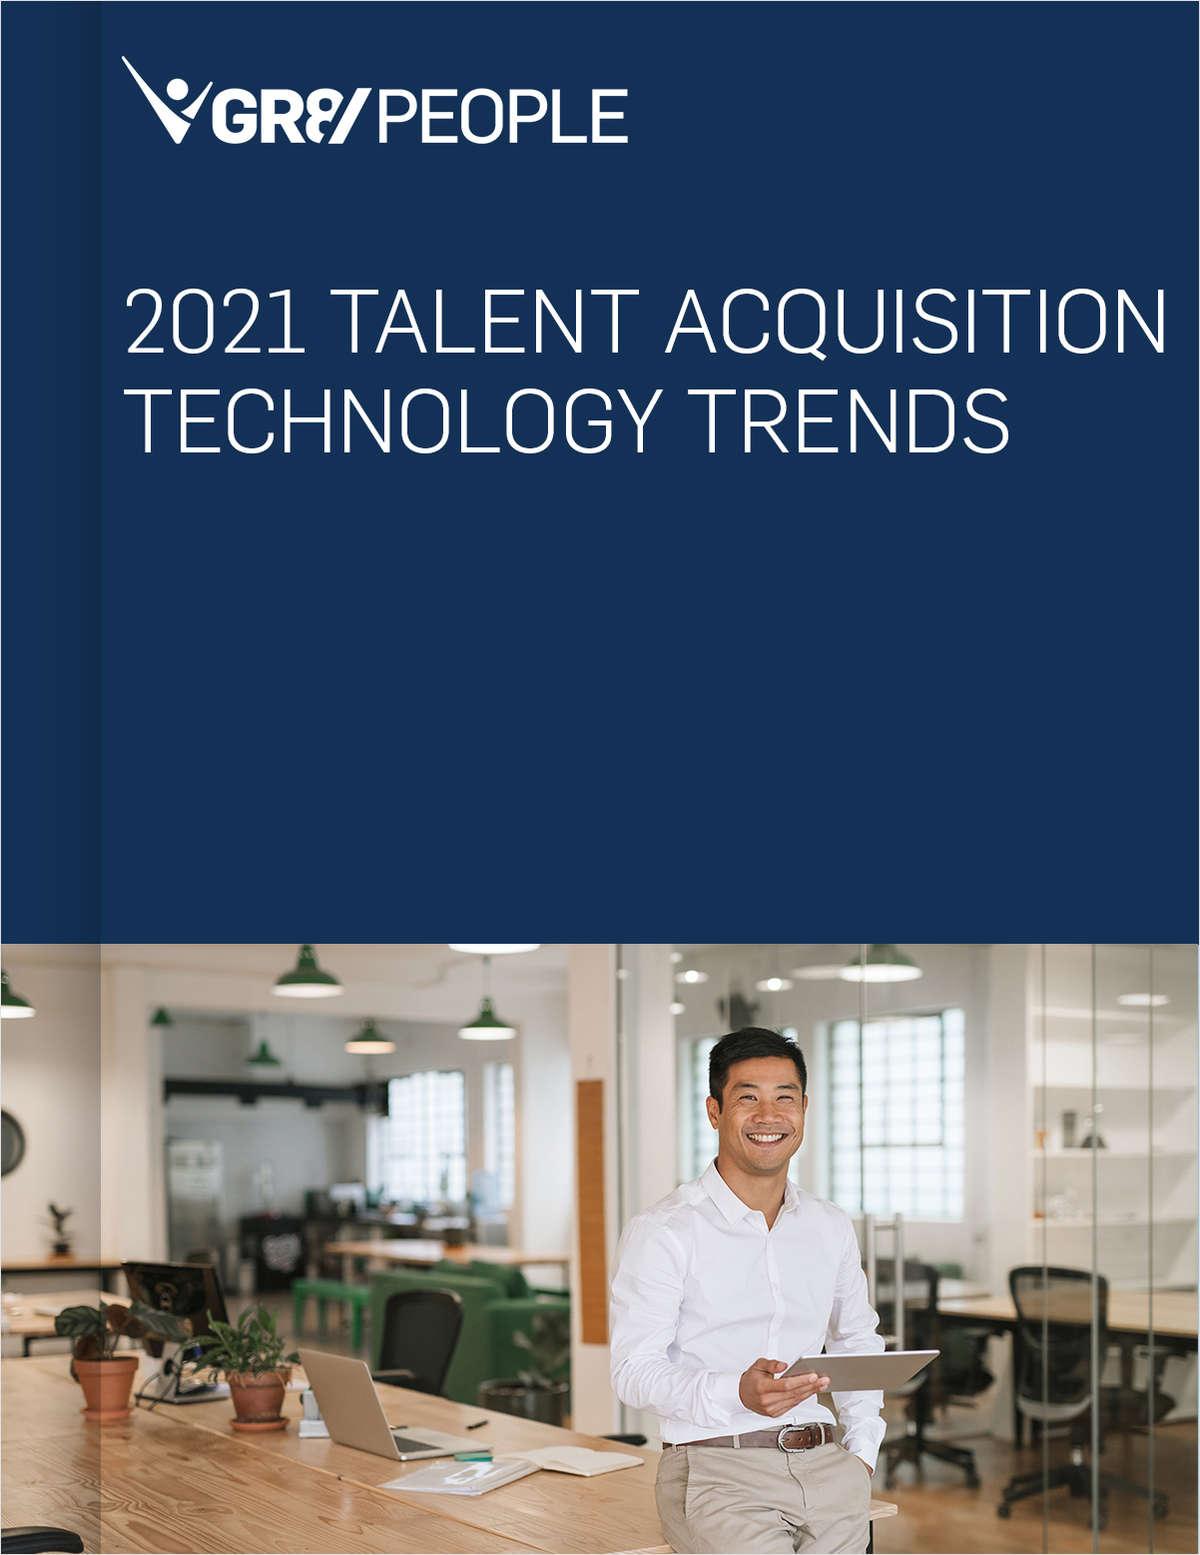 2021 Talent Acquisition Technology Trends